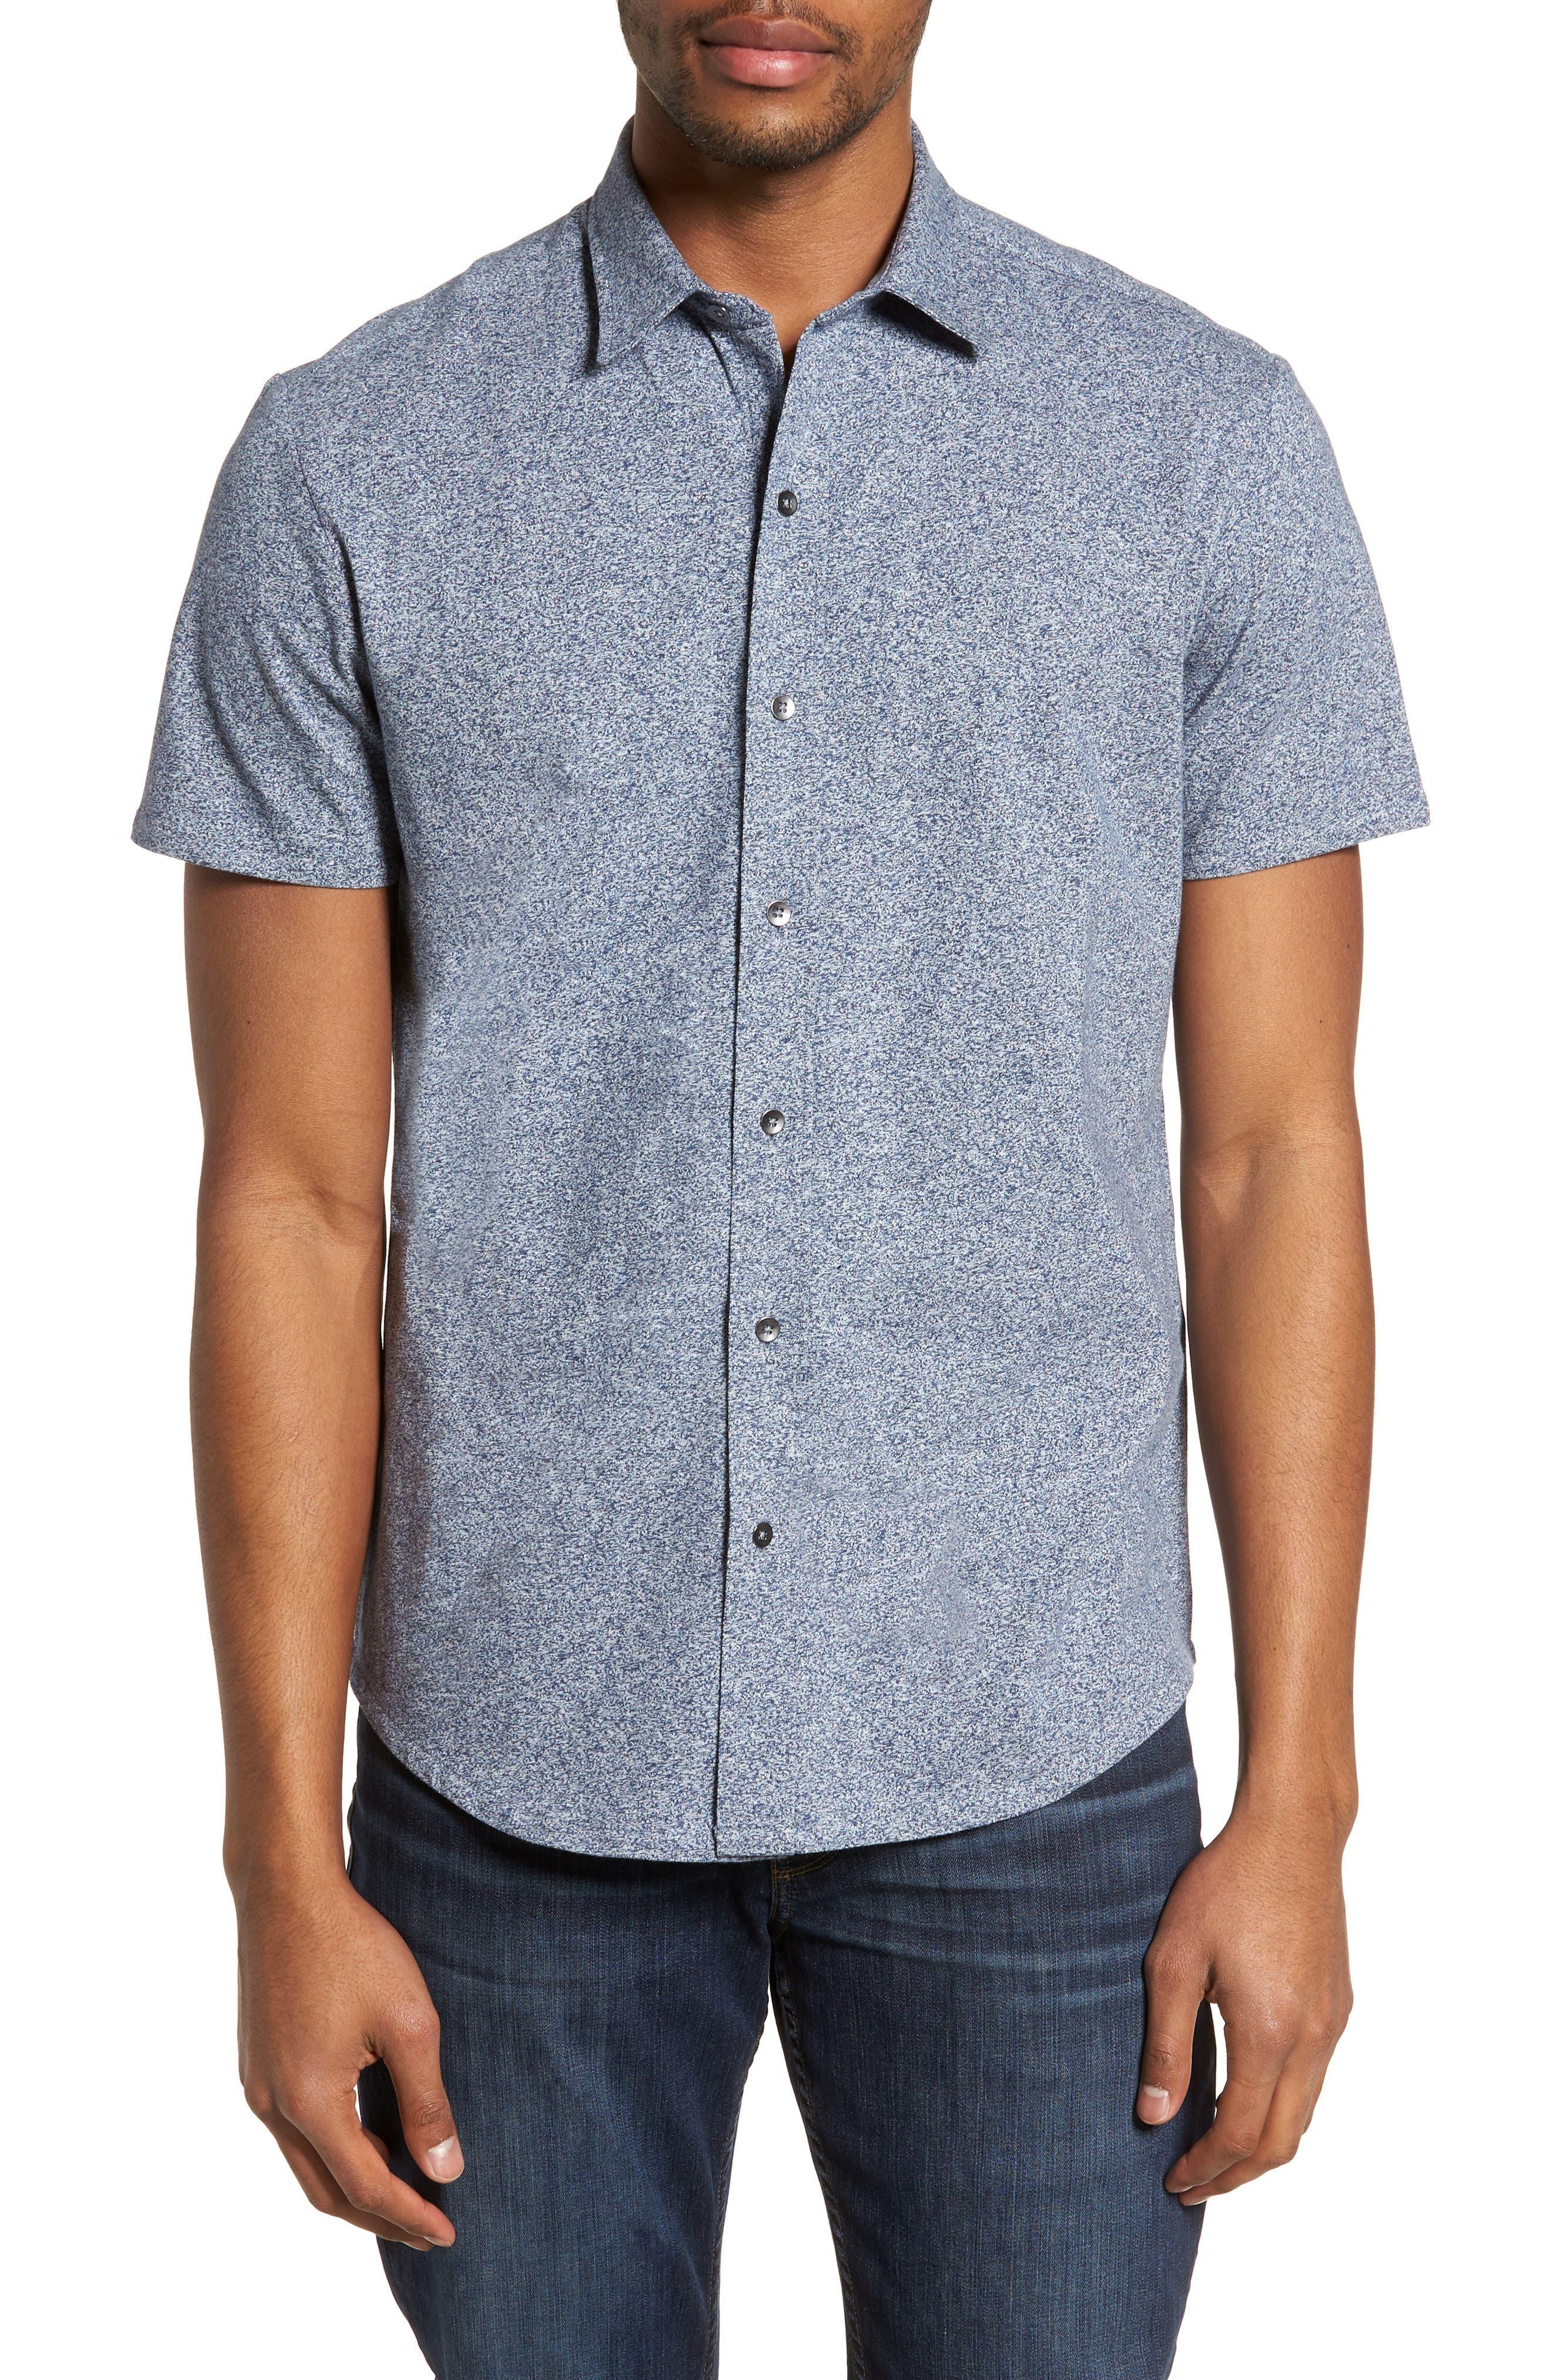 'Metropolitan' Knit Short Sleeve Sport Shirt,                         Main,                         color, NAVY/ WHITE